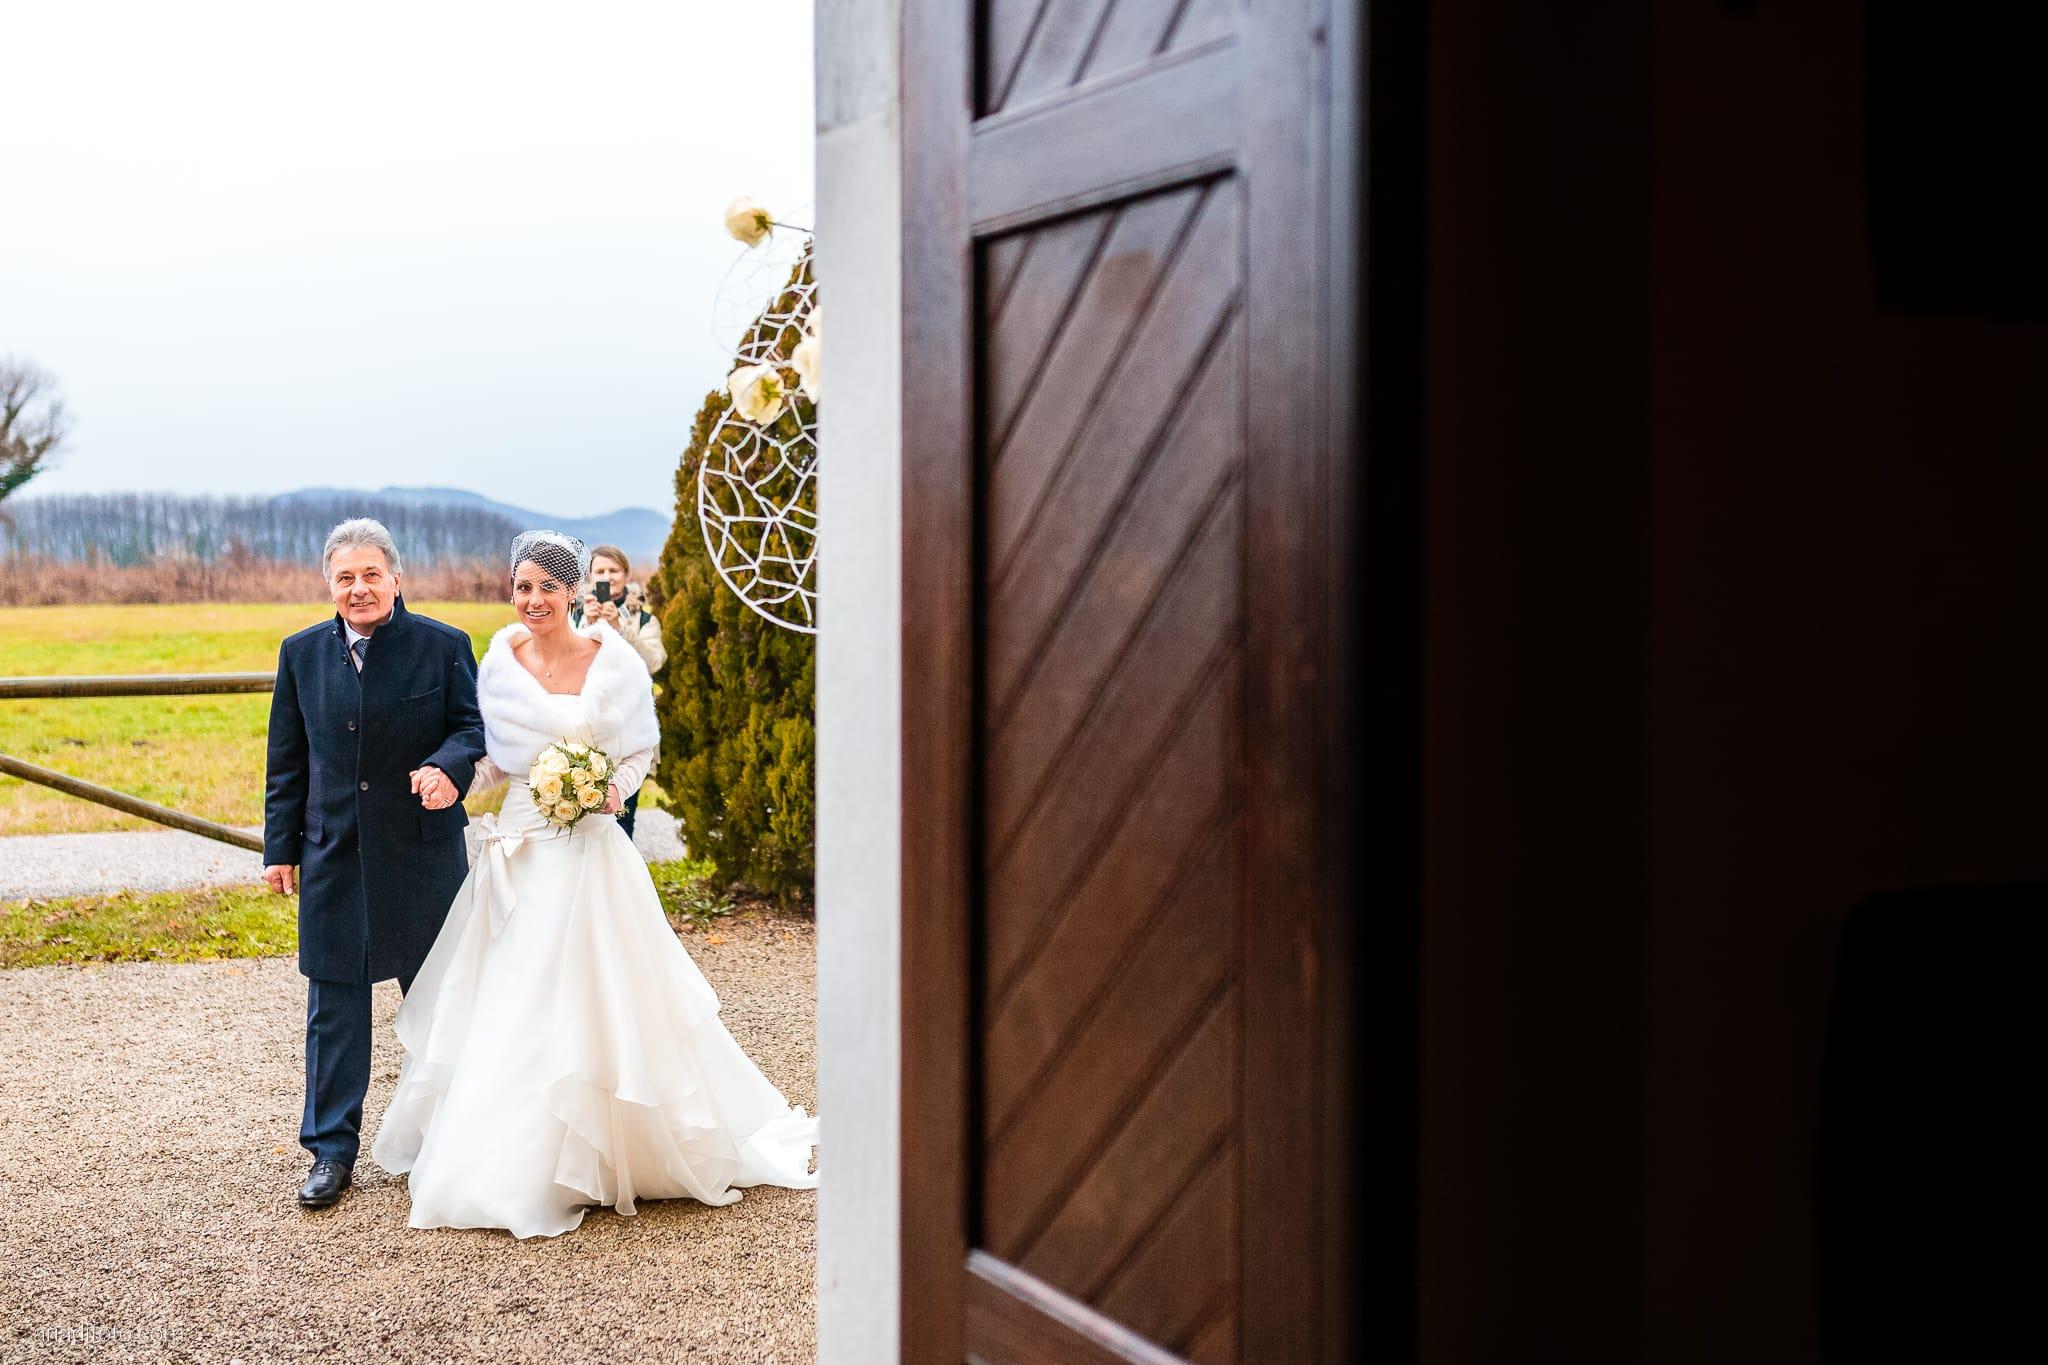 Elisa Matteo matrimonio Preval Gorizia Paradiso Pocenia Udine cerimonia ingresso sposa Santa Maria dei Popoli